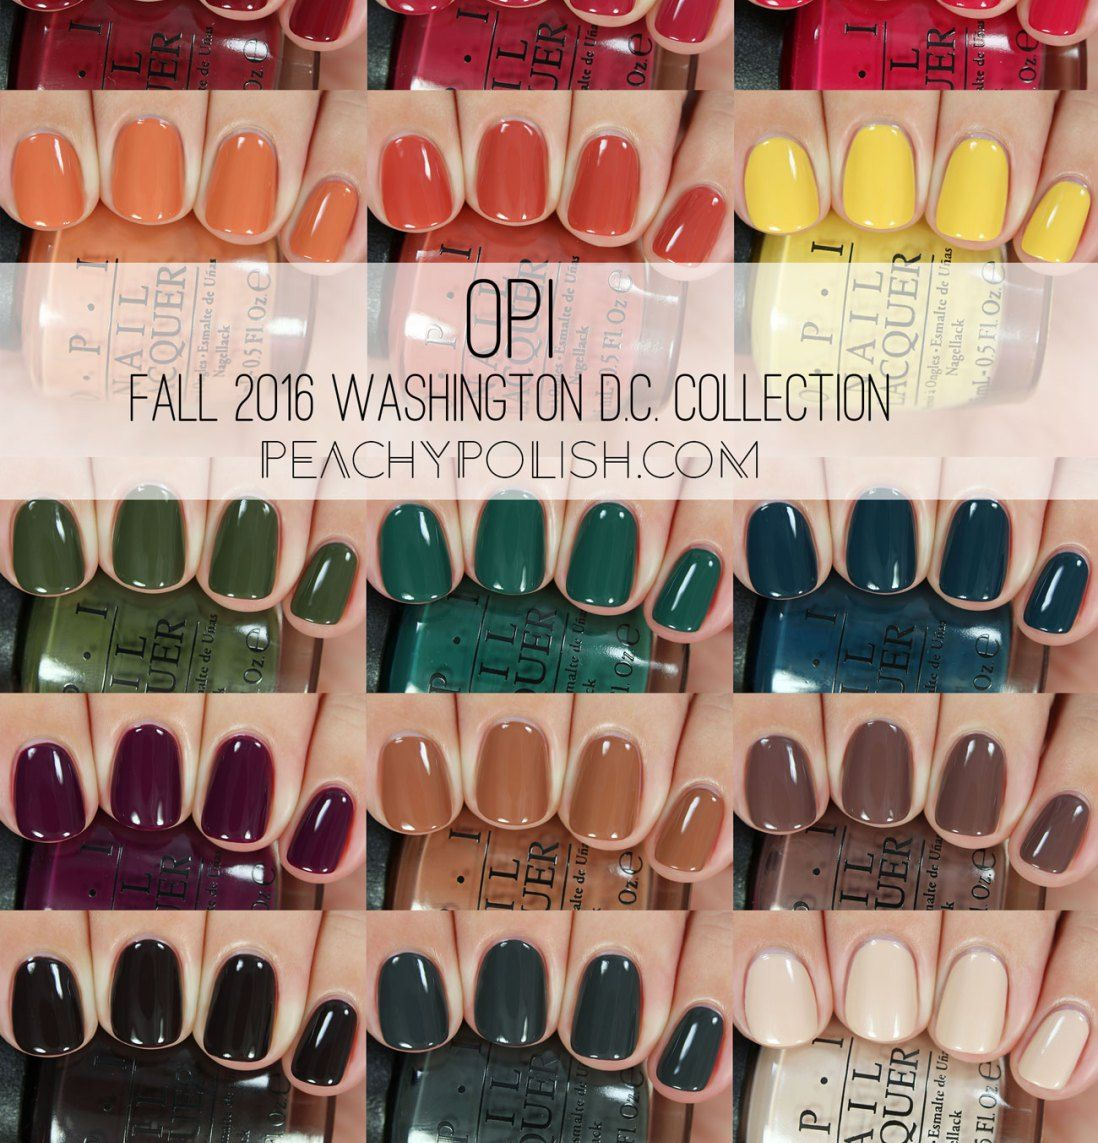 Opi Fall 2016 Washington D C Collection Peachy Polish Nails In 2019 Pinterest U 241 As De